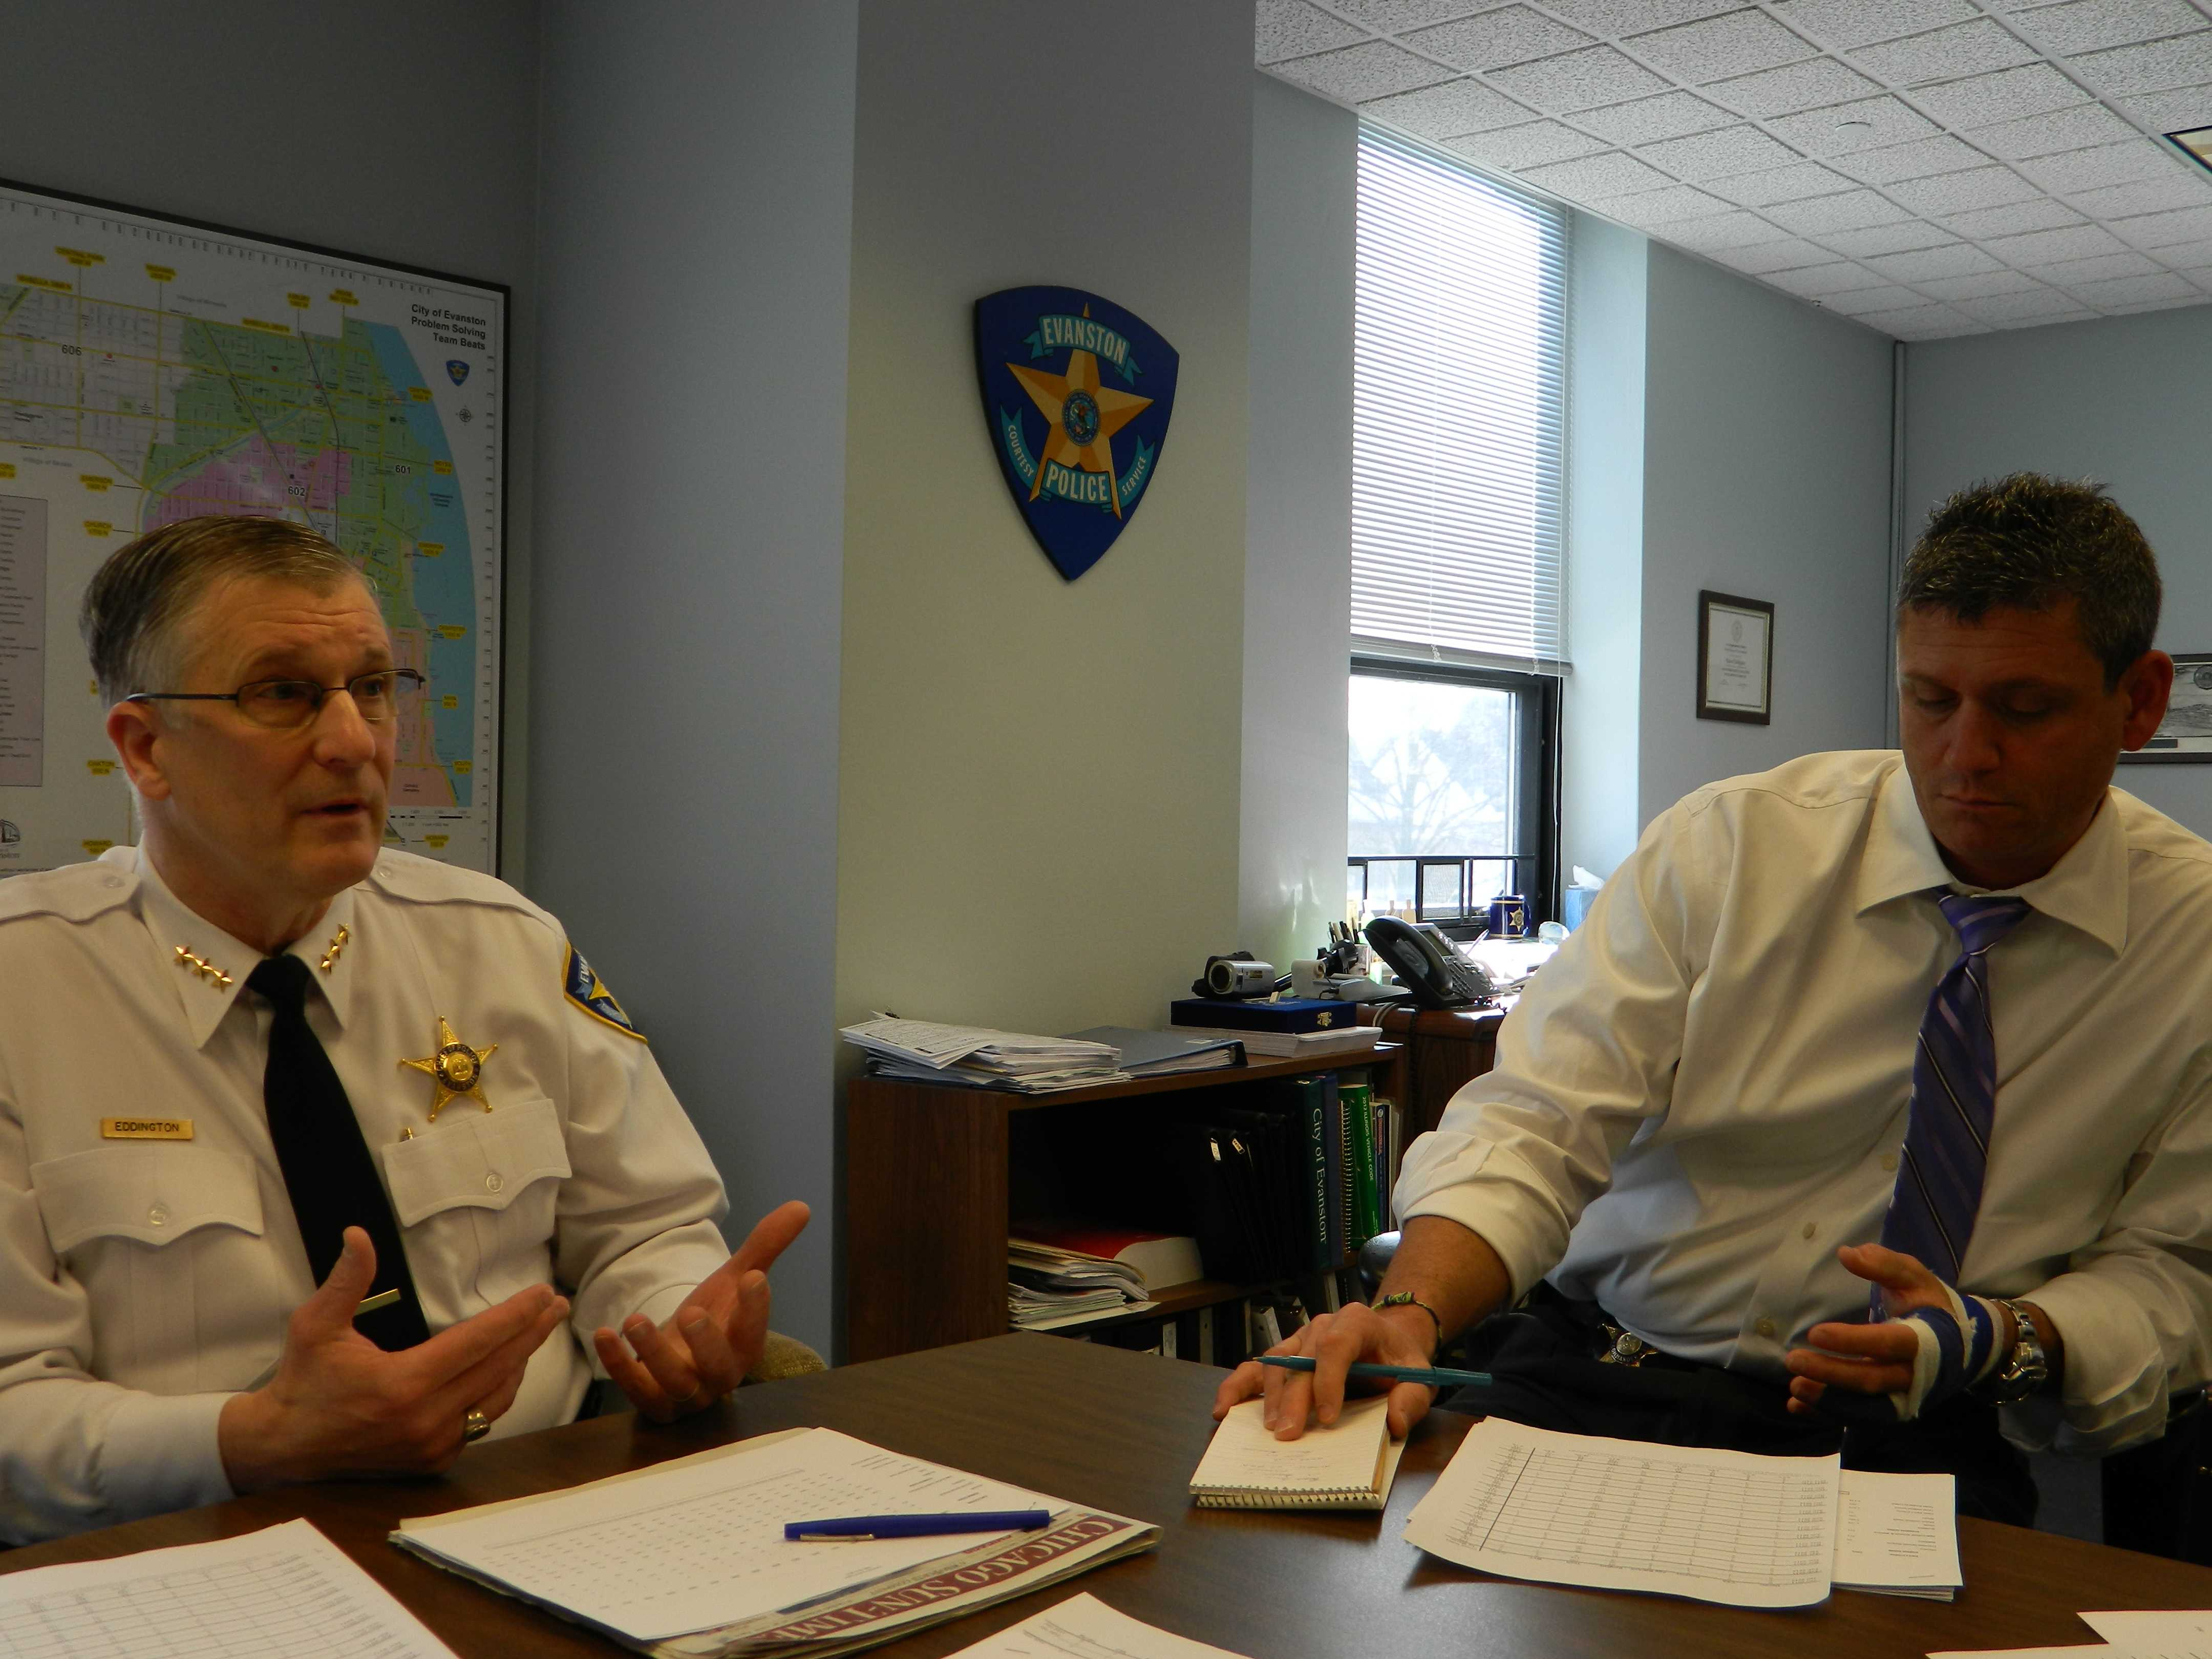 Evanston Police Chief Richard Eddington (left) and Cmdr. Jay Parrott shared Evanston crime data for 2012 on Friday.